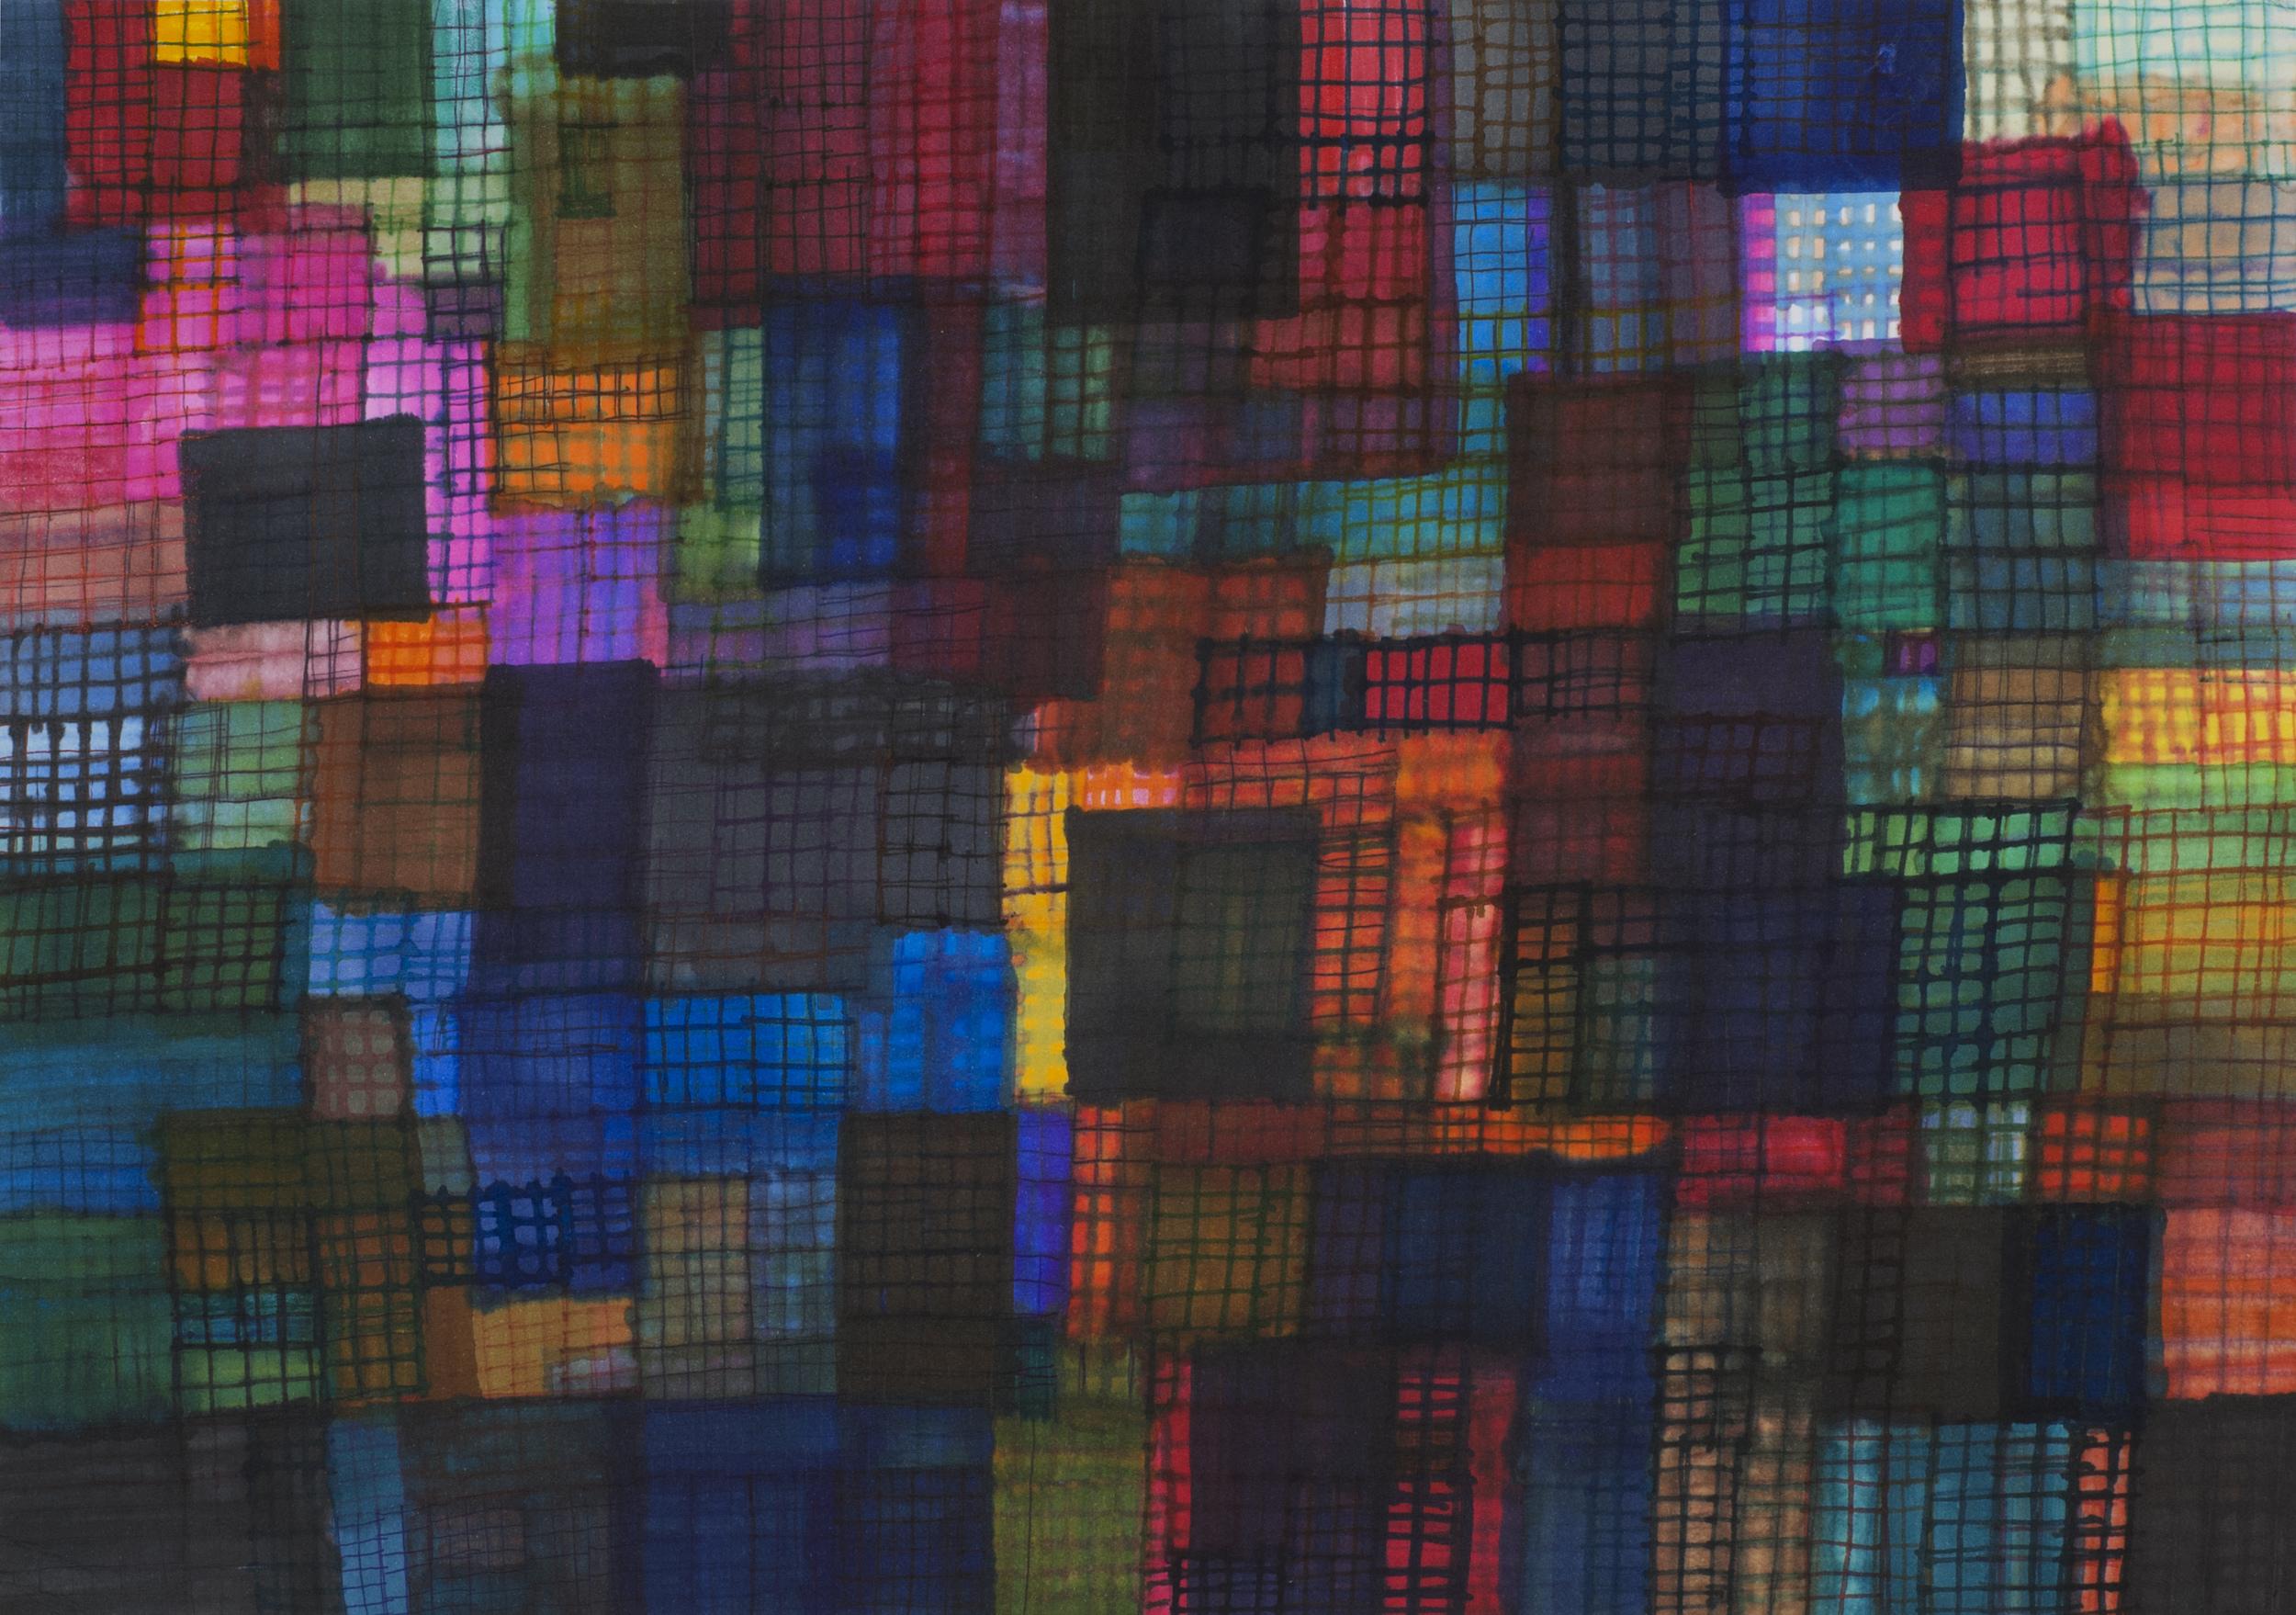 Yuka Yamane    Mosaic  , 2010 Pen and paper 10.51 x 14.84 inches / 26.7 x 37.7 cm / YYam 2